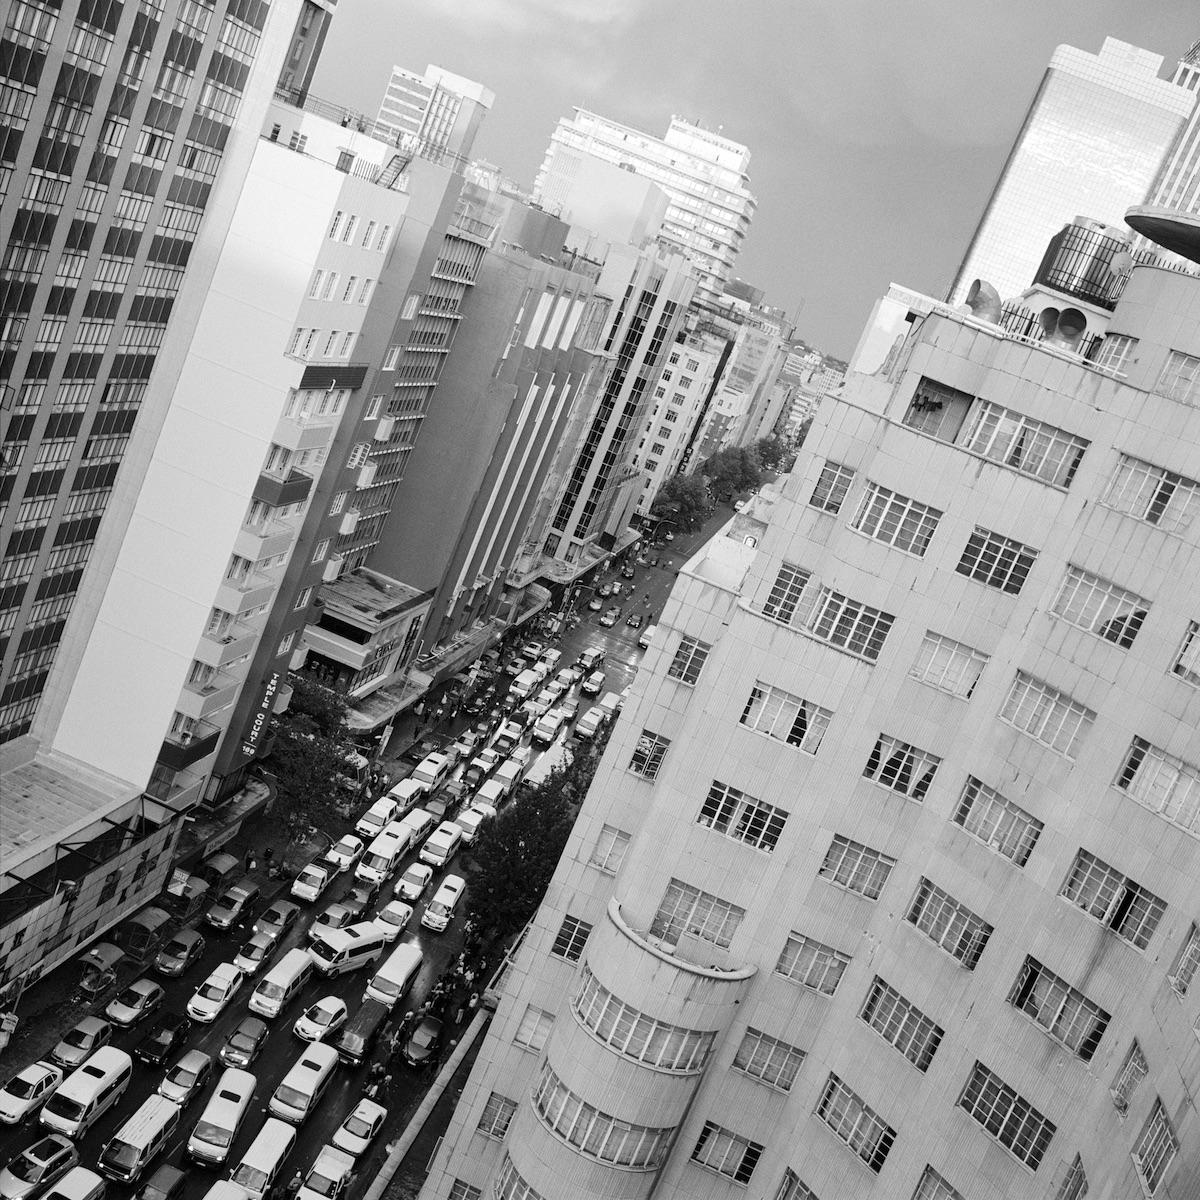 Akinbode Akinbiyi, Downtown Johannesburg, 2013 © the artist